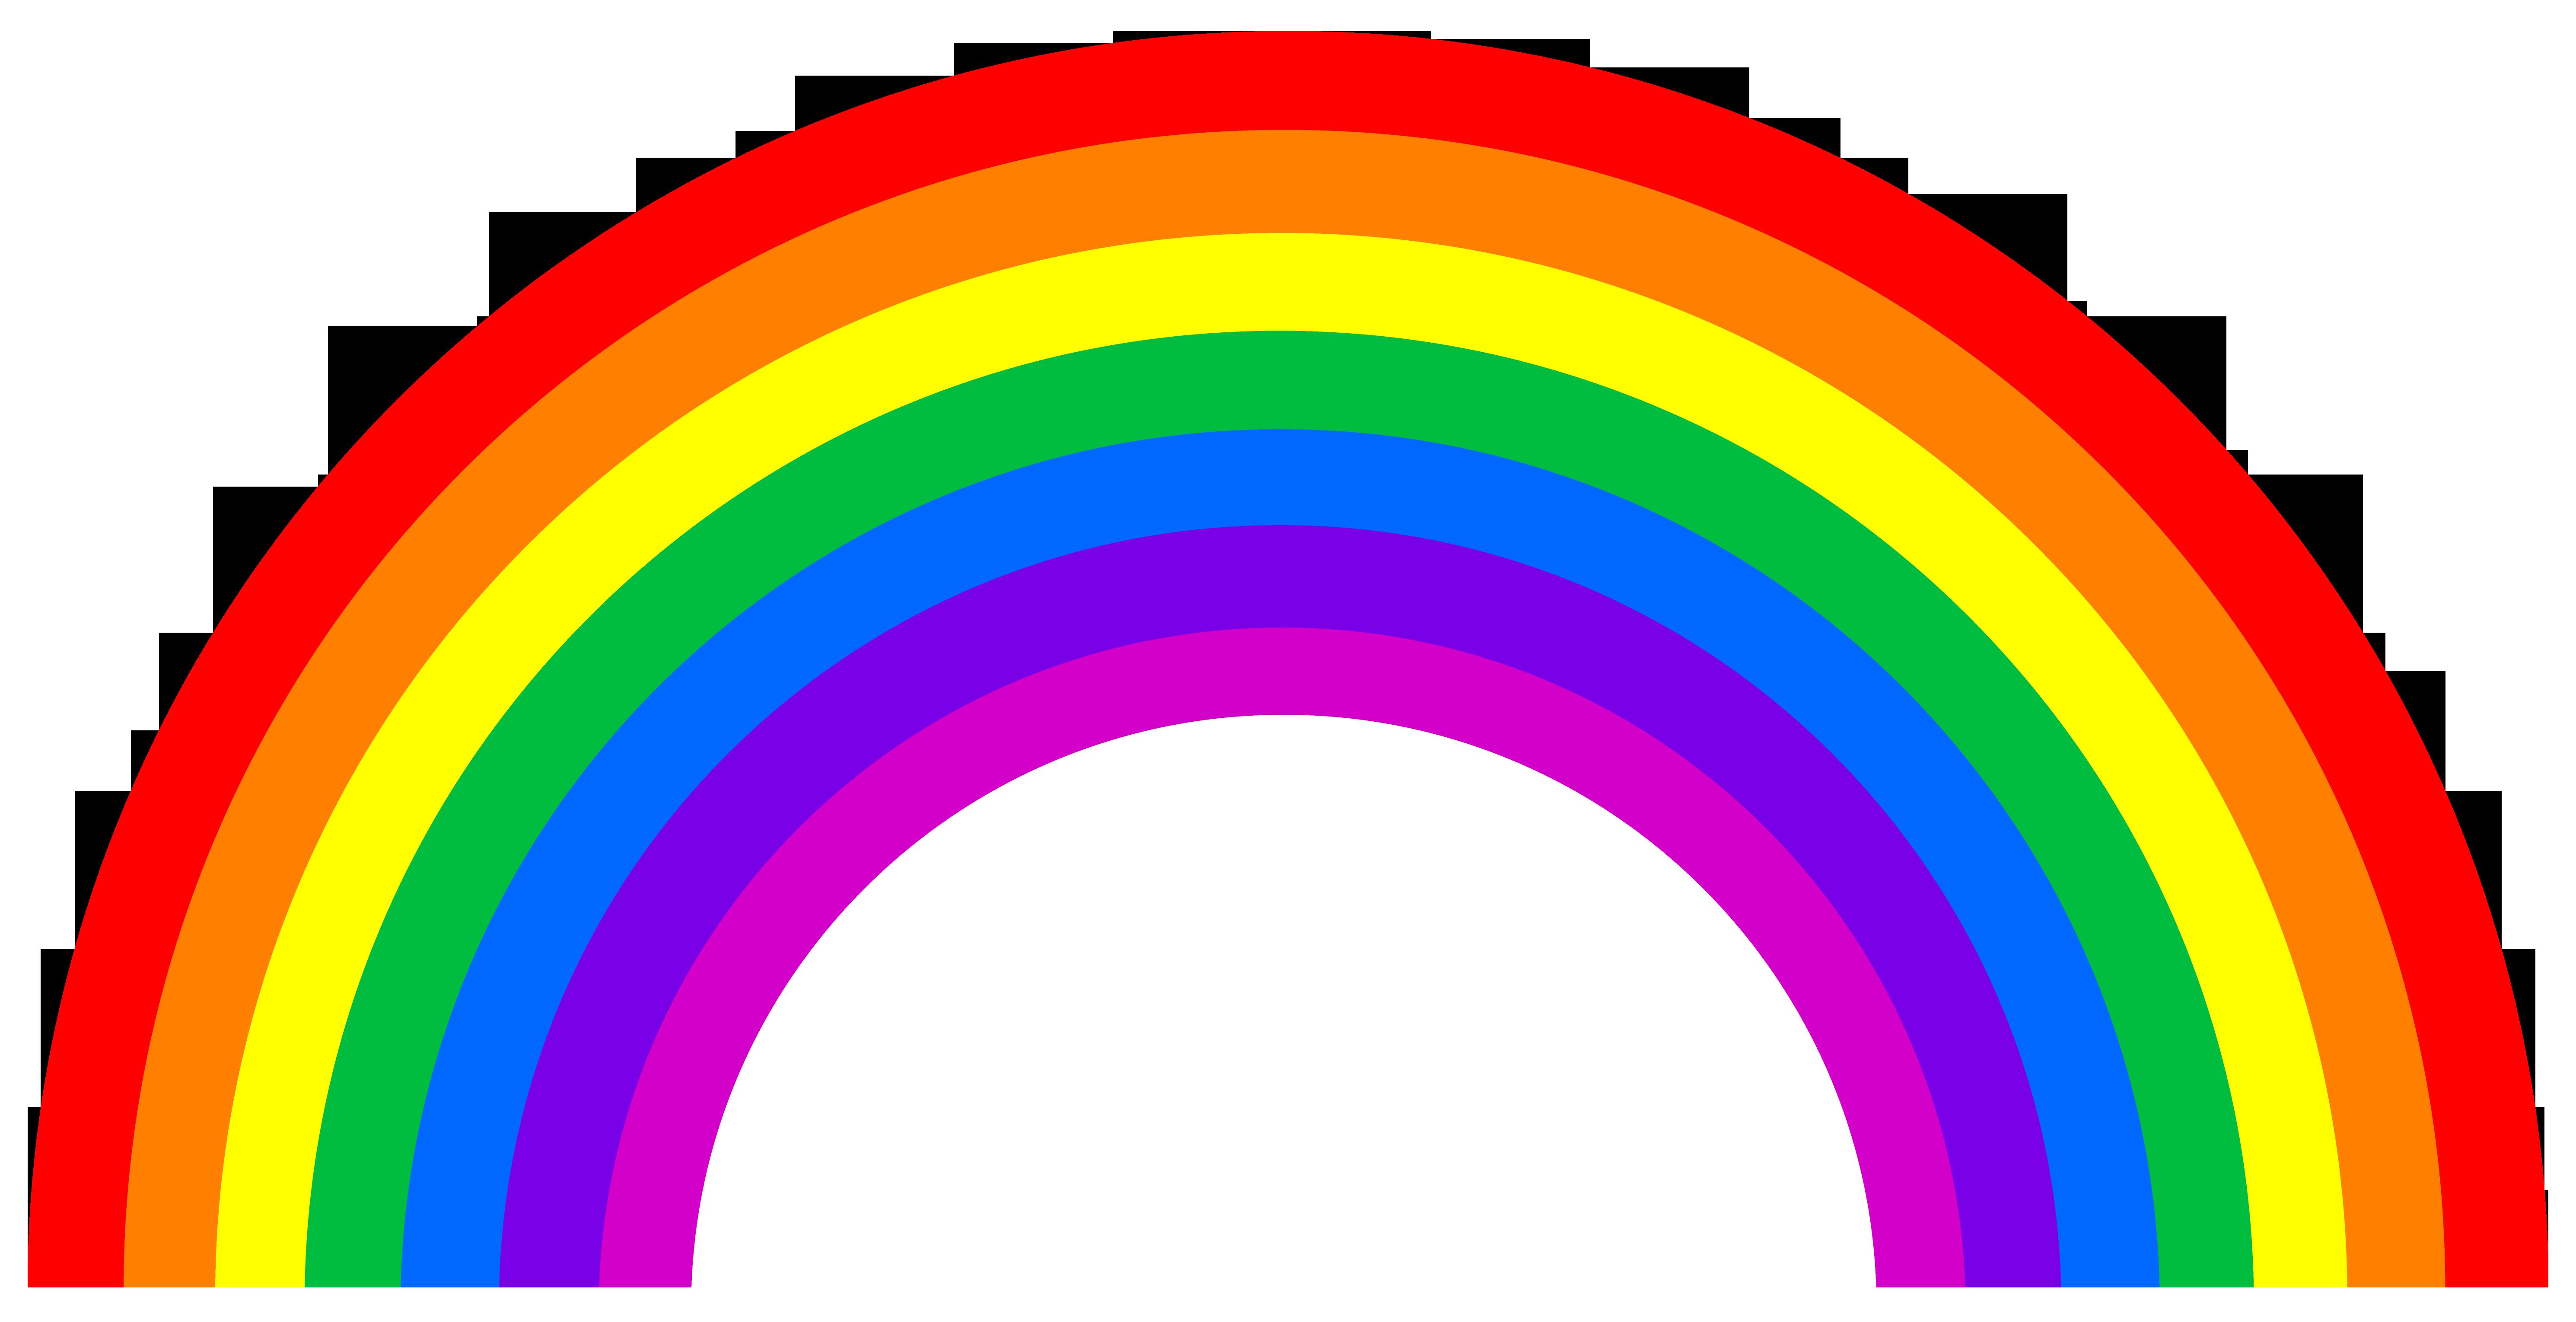 Rainbow HD PNG - 90659